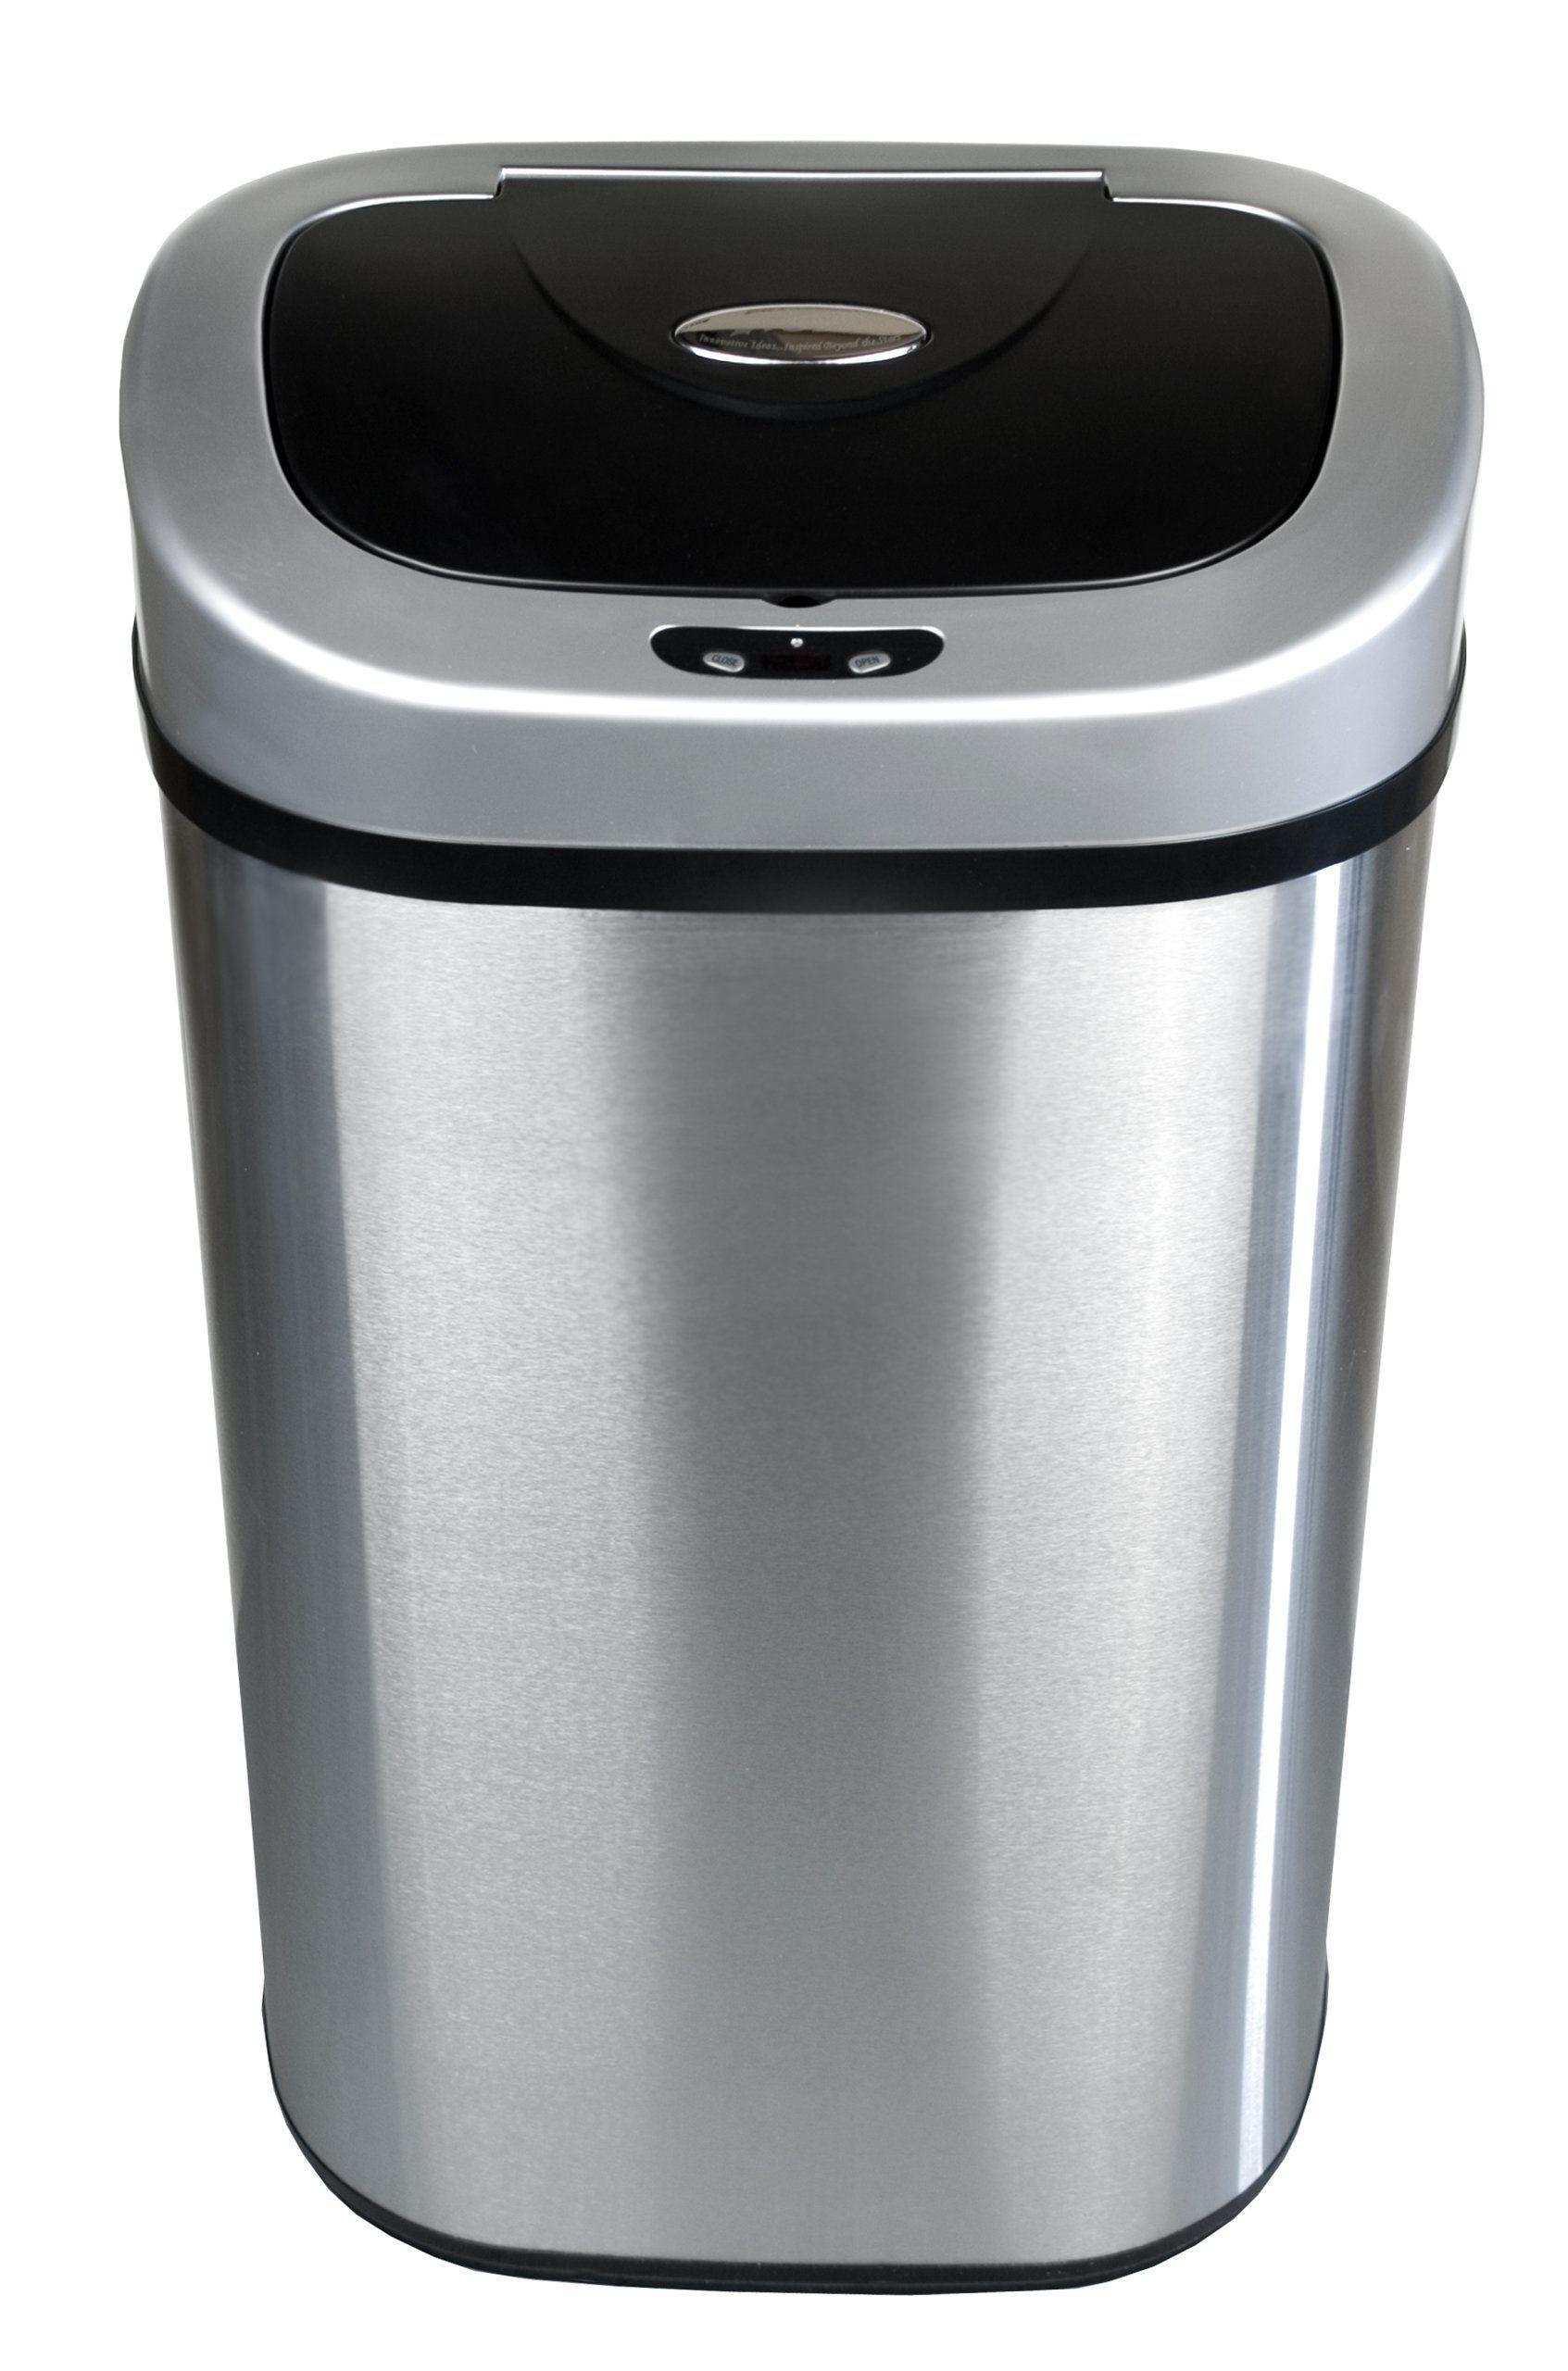 Amazon White Kitchen Garbage Can Instaimage